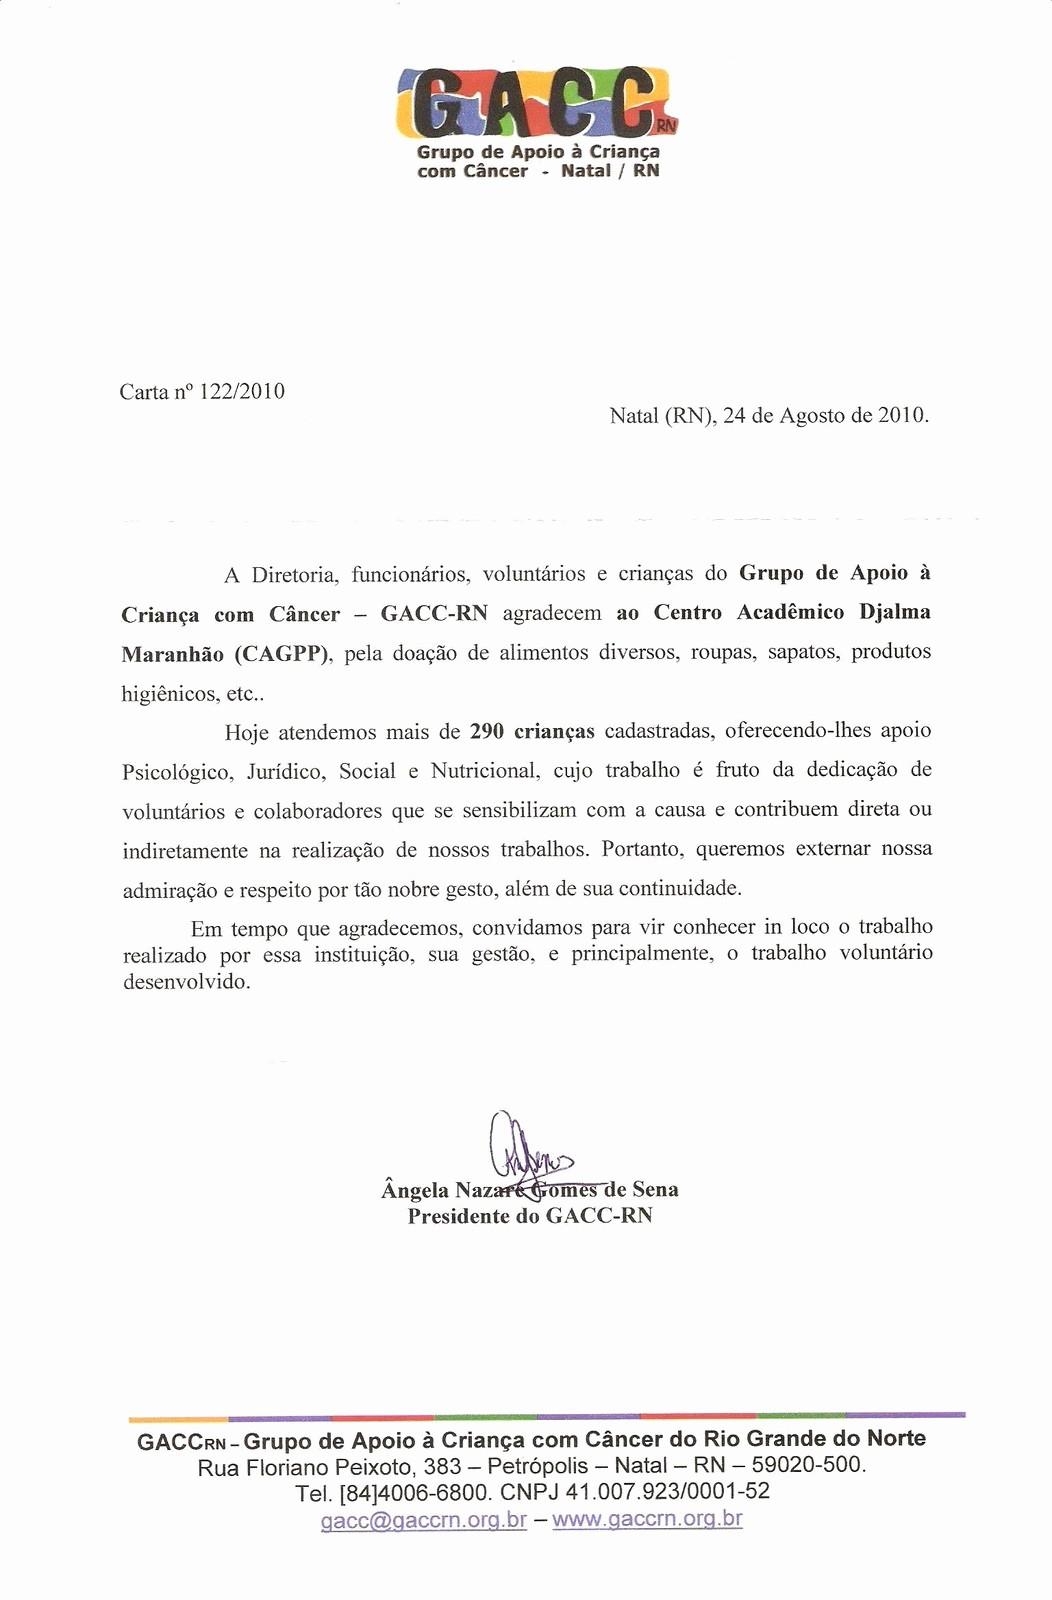 Modelo De Carta De Agradecimento Unique Cagpp Carta De Agradecimento Do Gacc